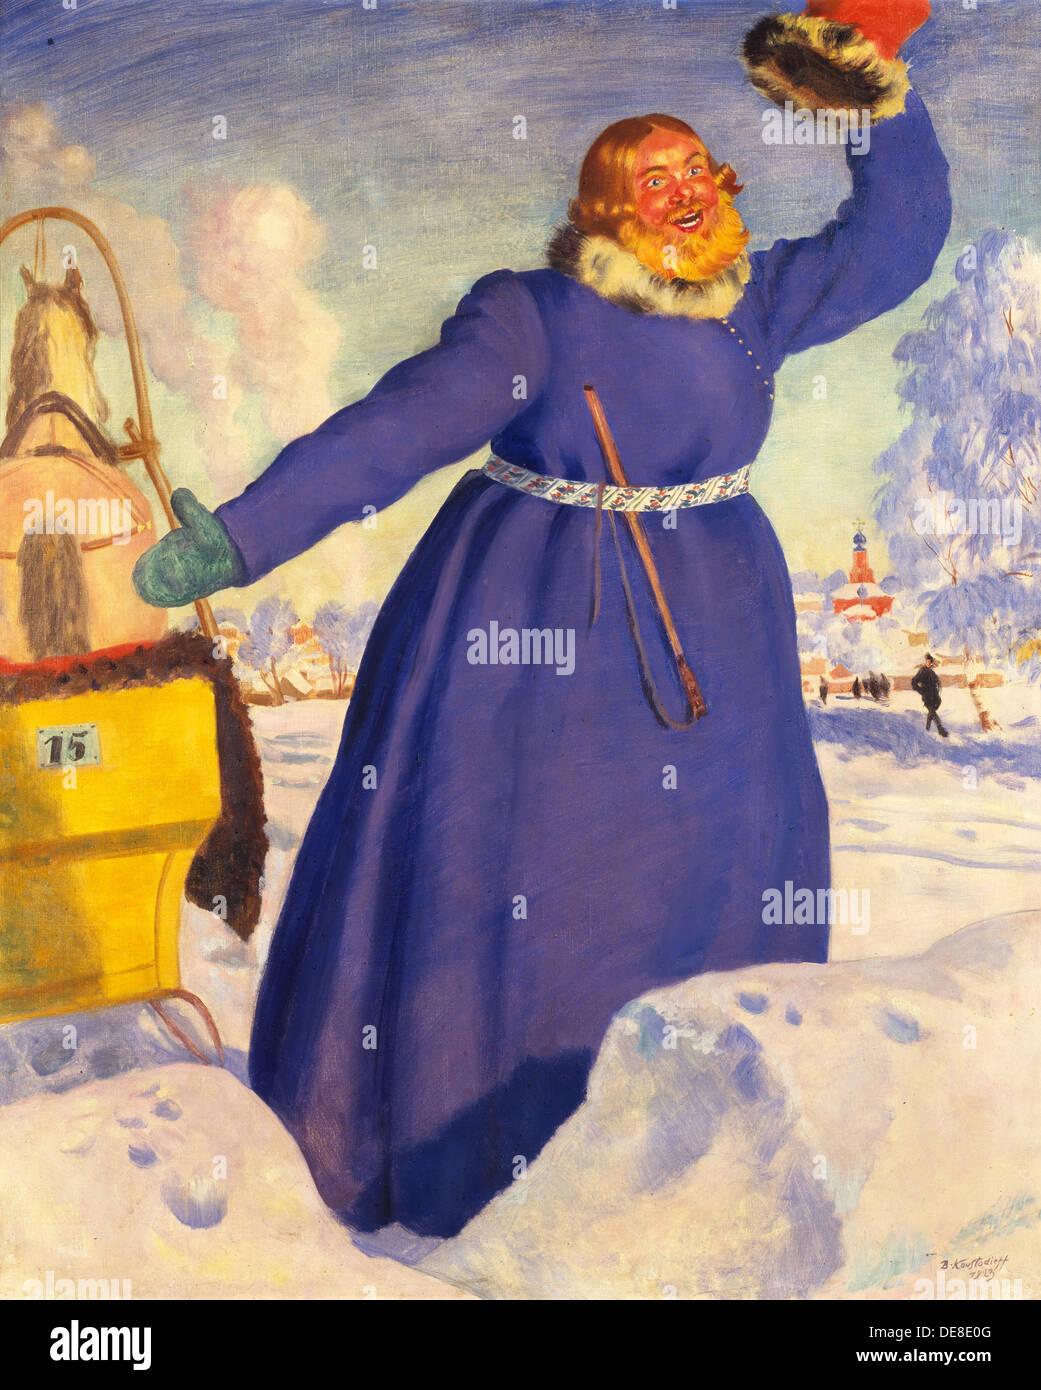 A reckless coachman, 1920. Artist: Kustodiev, Boris Michaylovich (1878-1927) - Stock Image